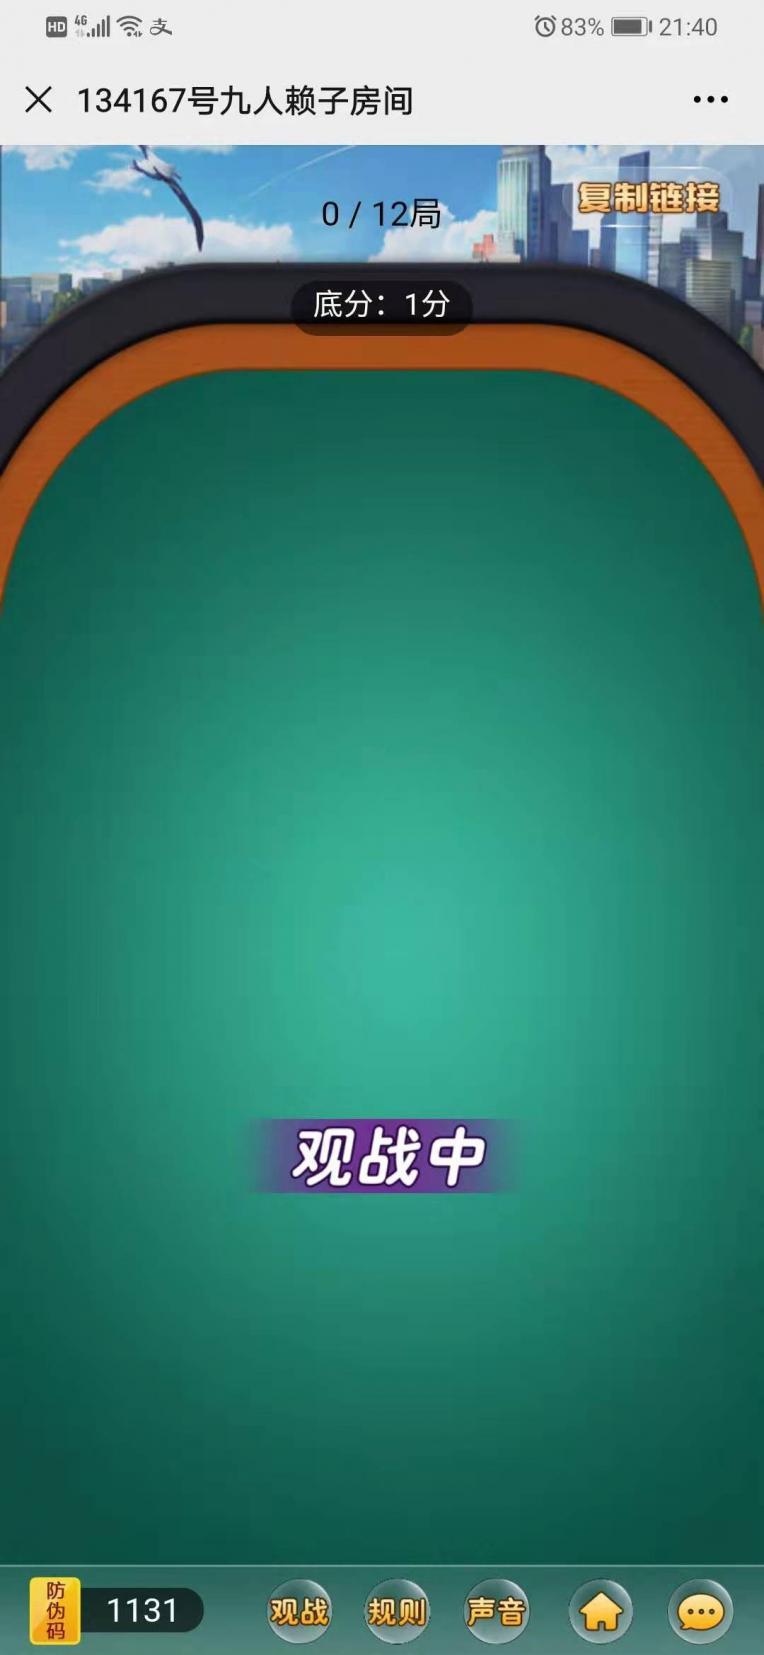 H5神兽棋牌游戏 九天大厅(修复版)包搭建-完美源码